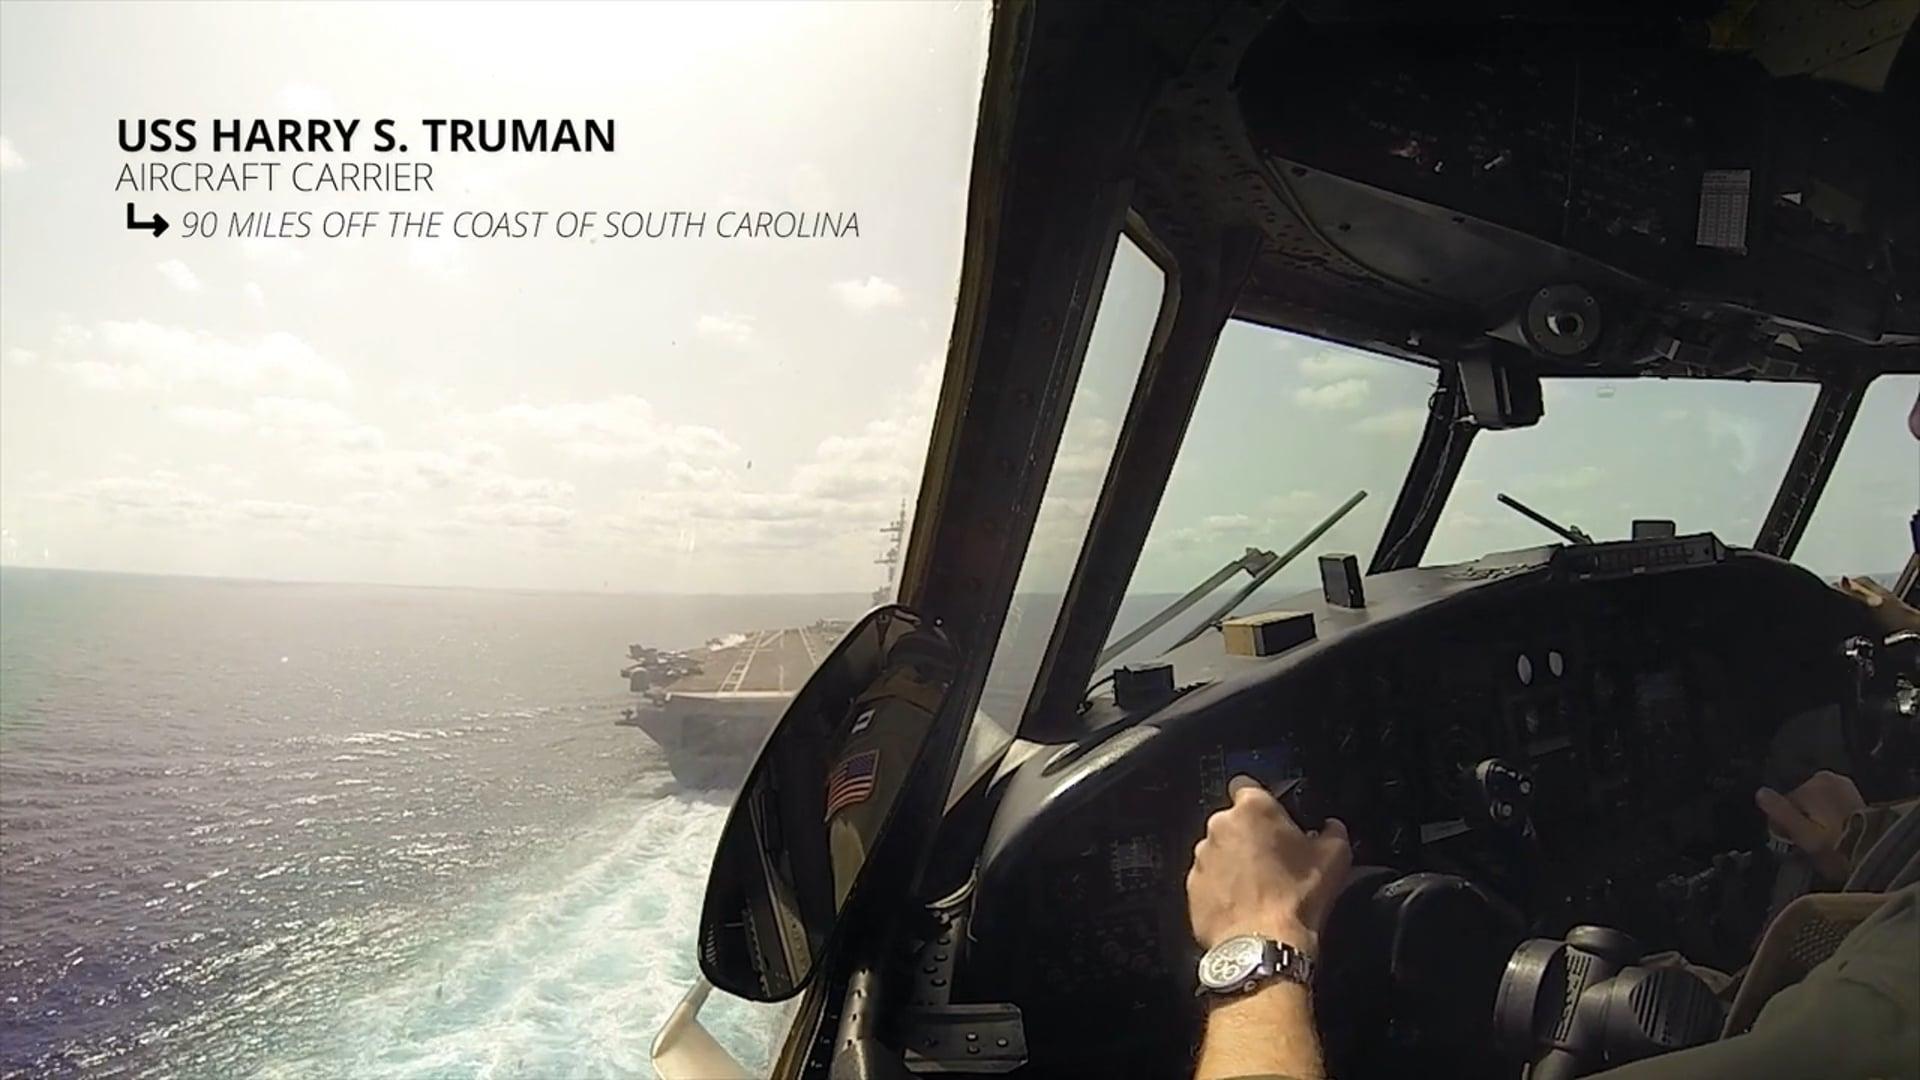 Make-A-Wish Foundation : Aboard USS Harry S. Truman (CVN 75)